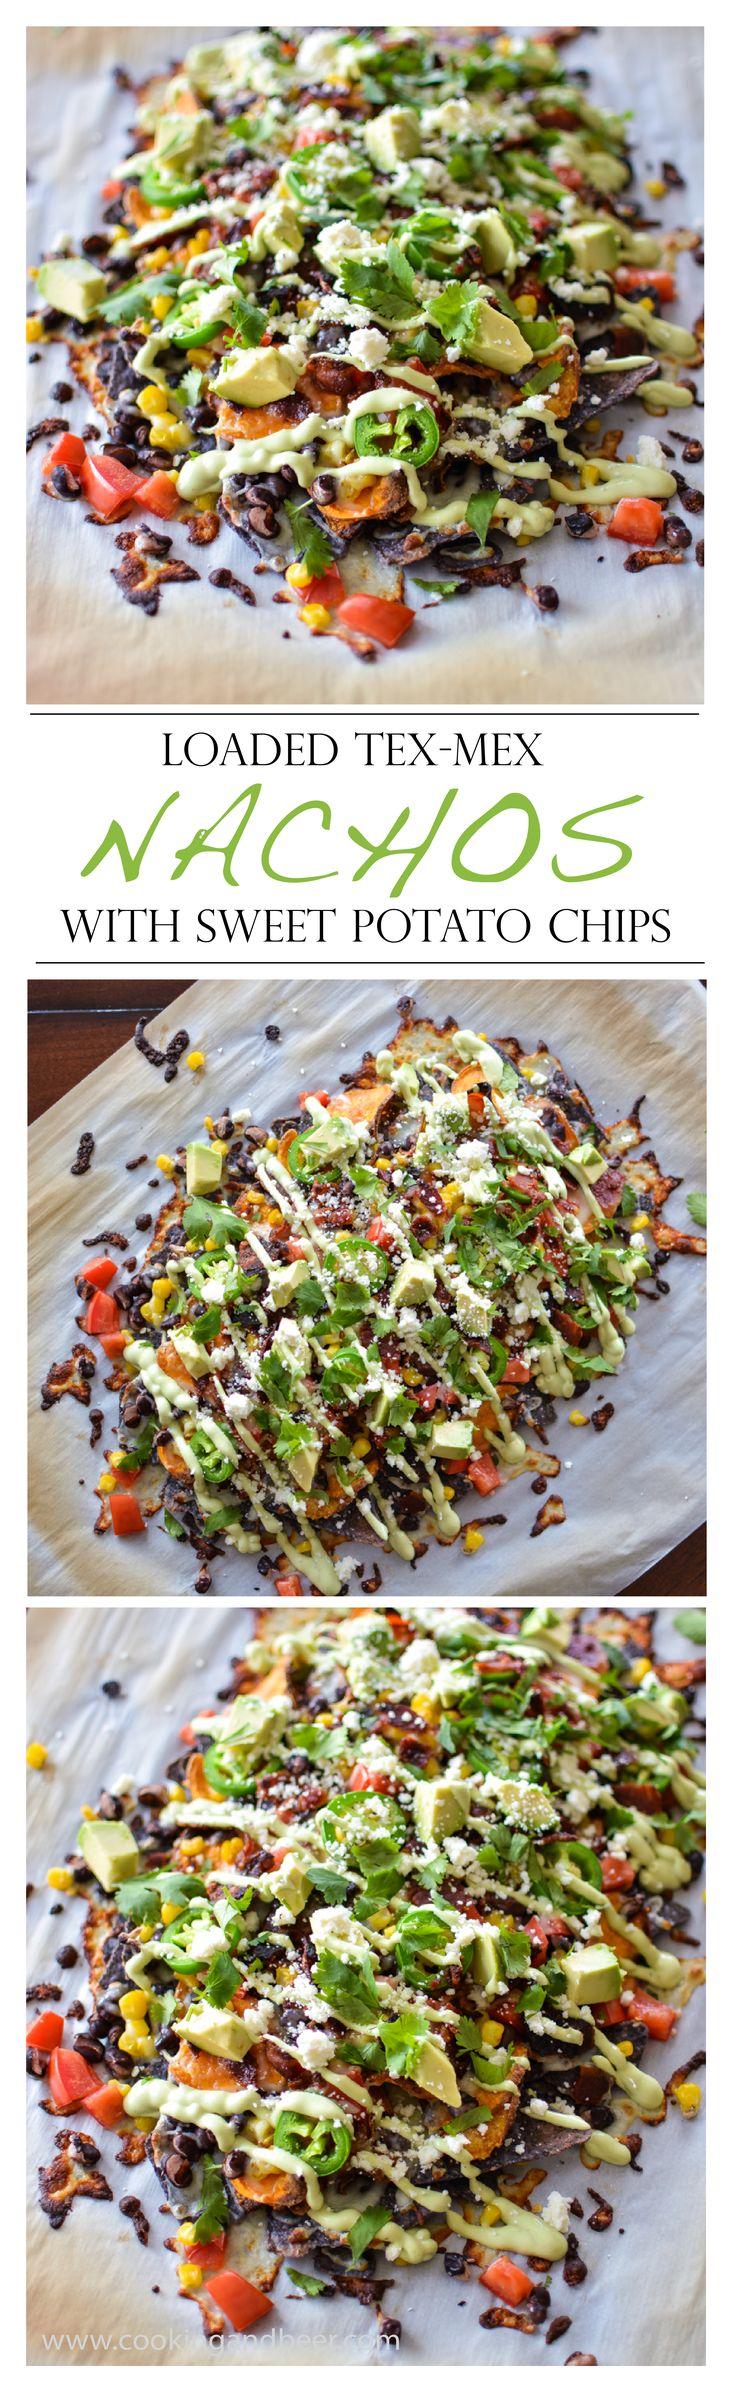 Loaded Tex Mex Nachos with Sweet Potato Chips | www.cookingandbeer.com | @jalanesulia